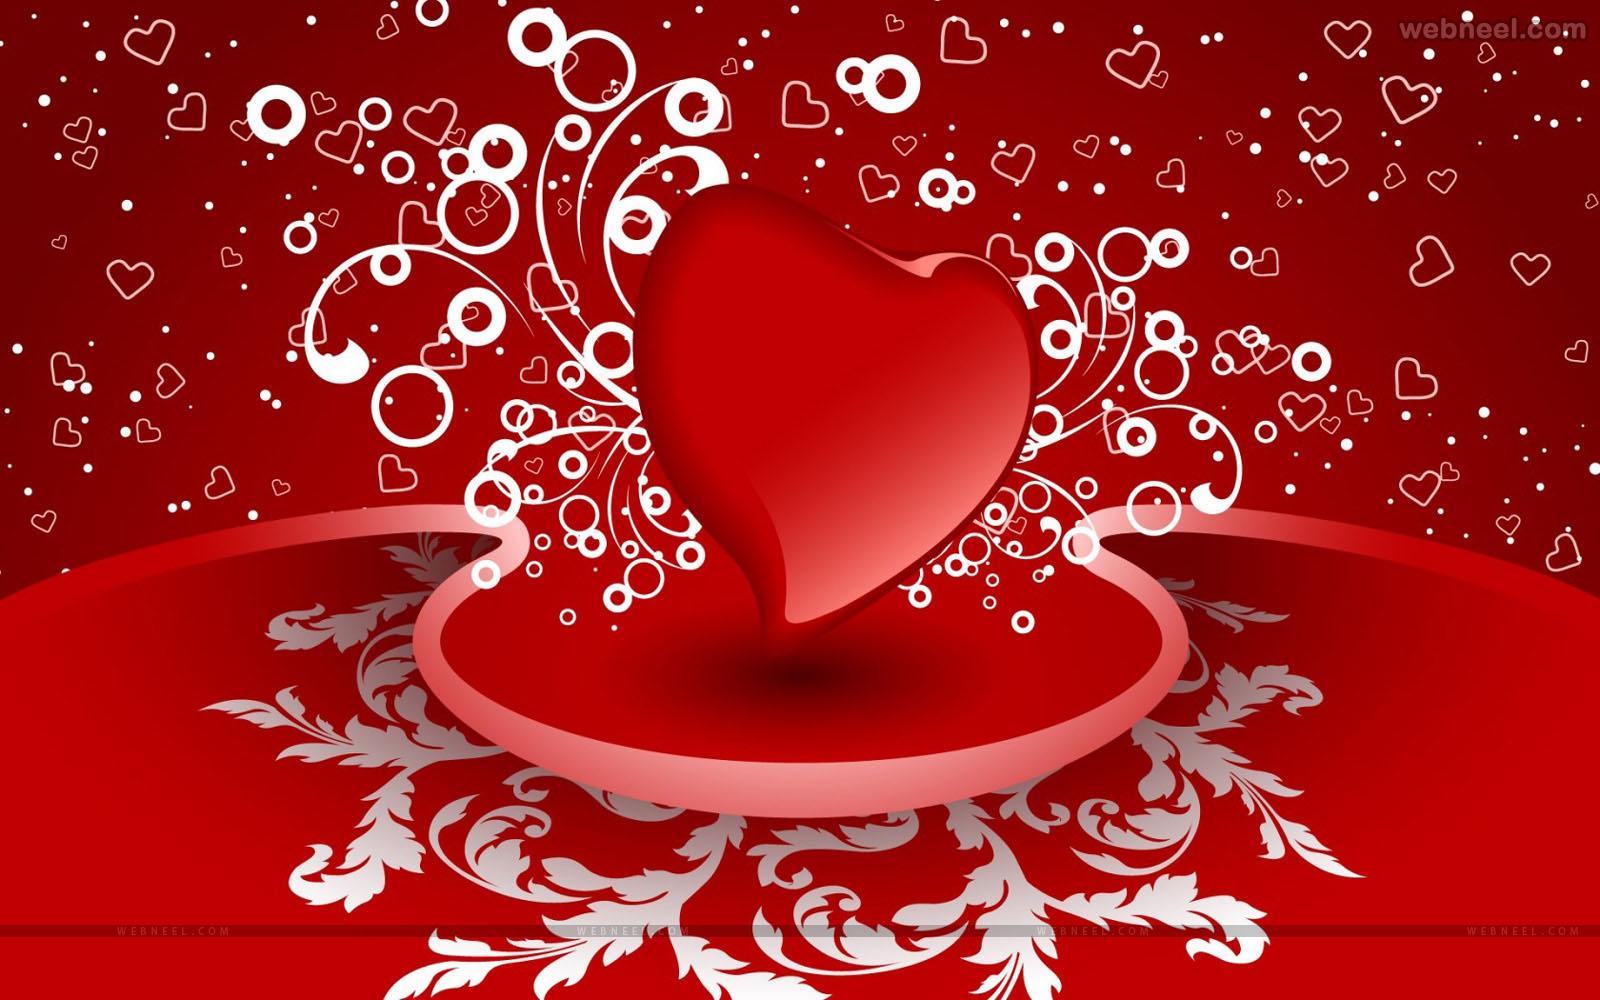 red heart romantic valentine wallpaper   o 1600x1000